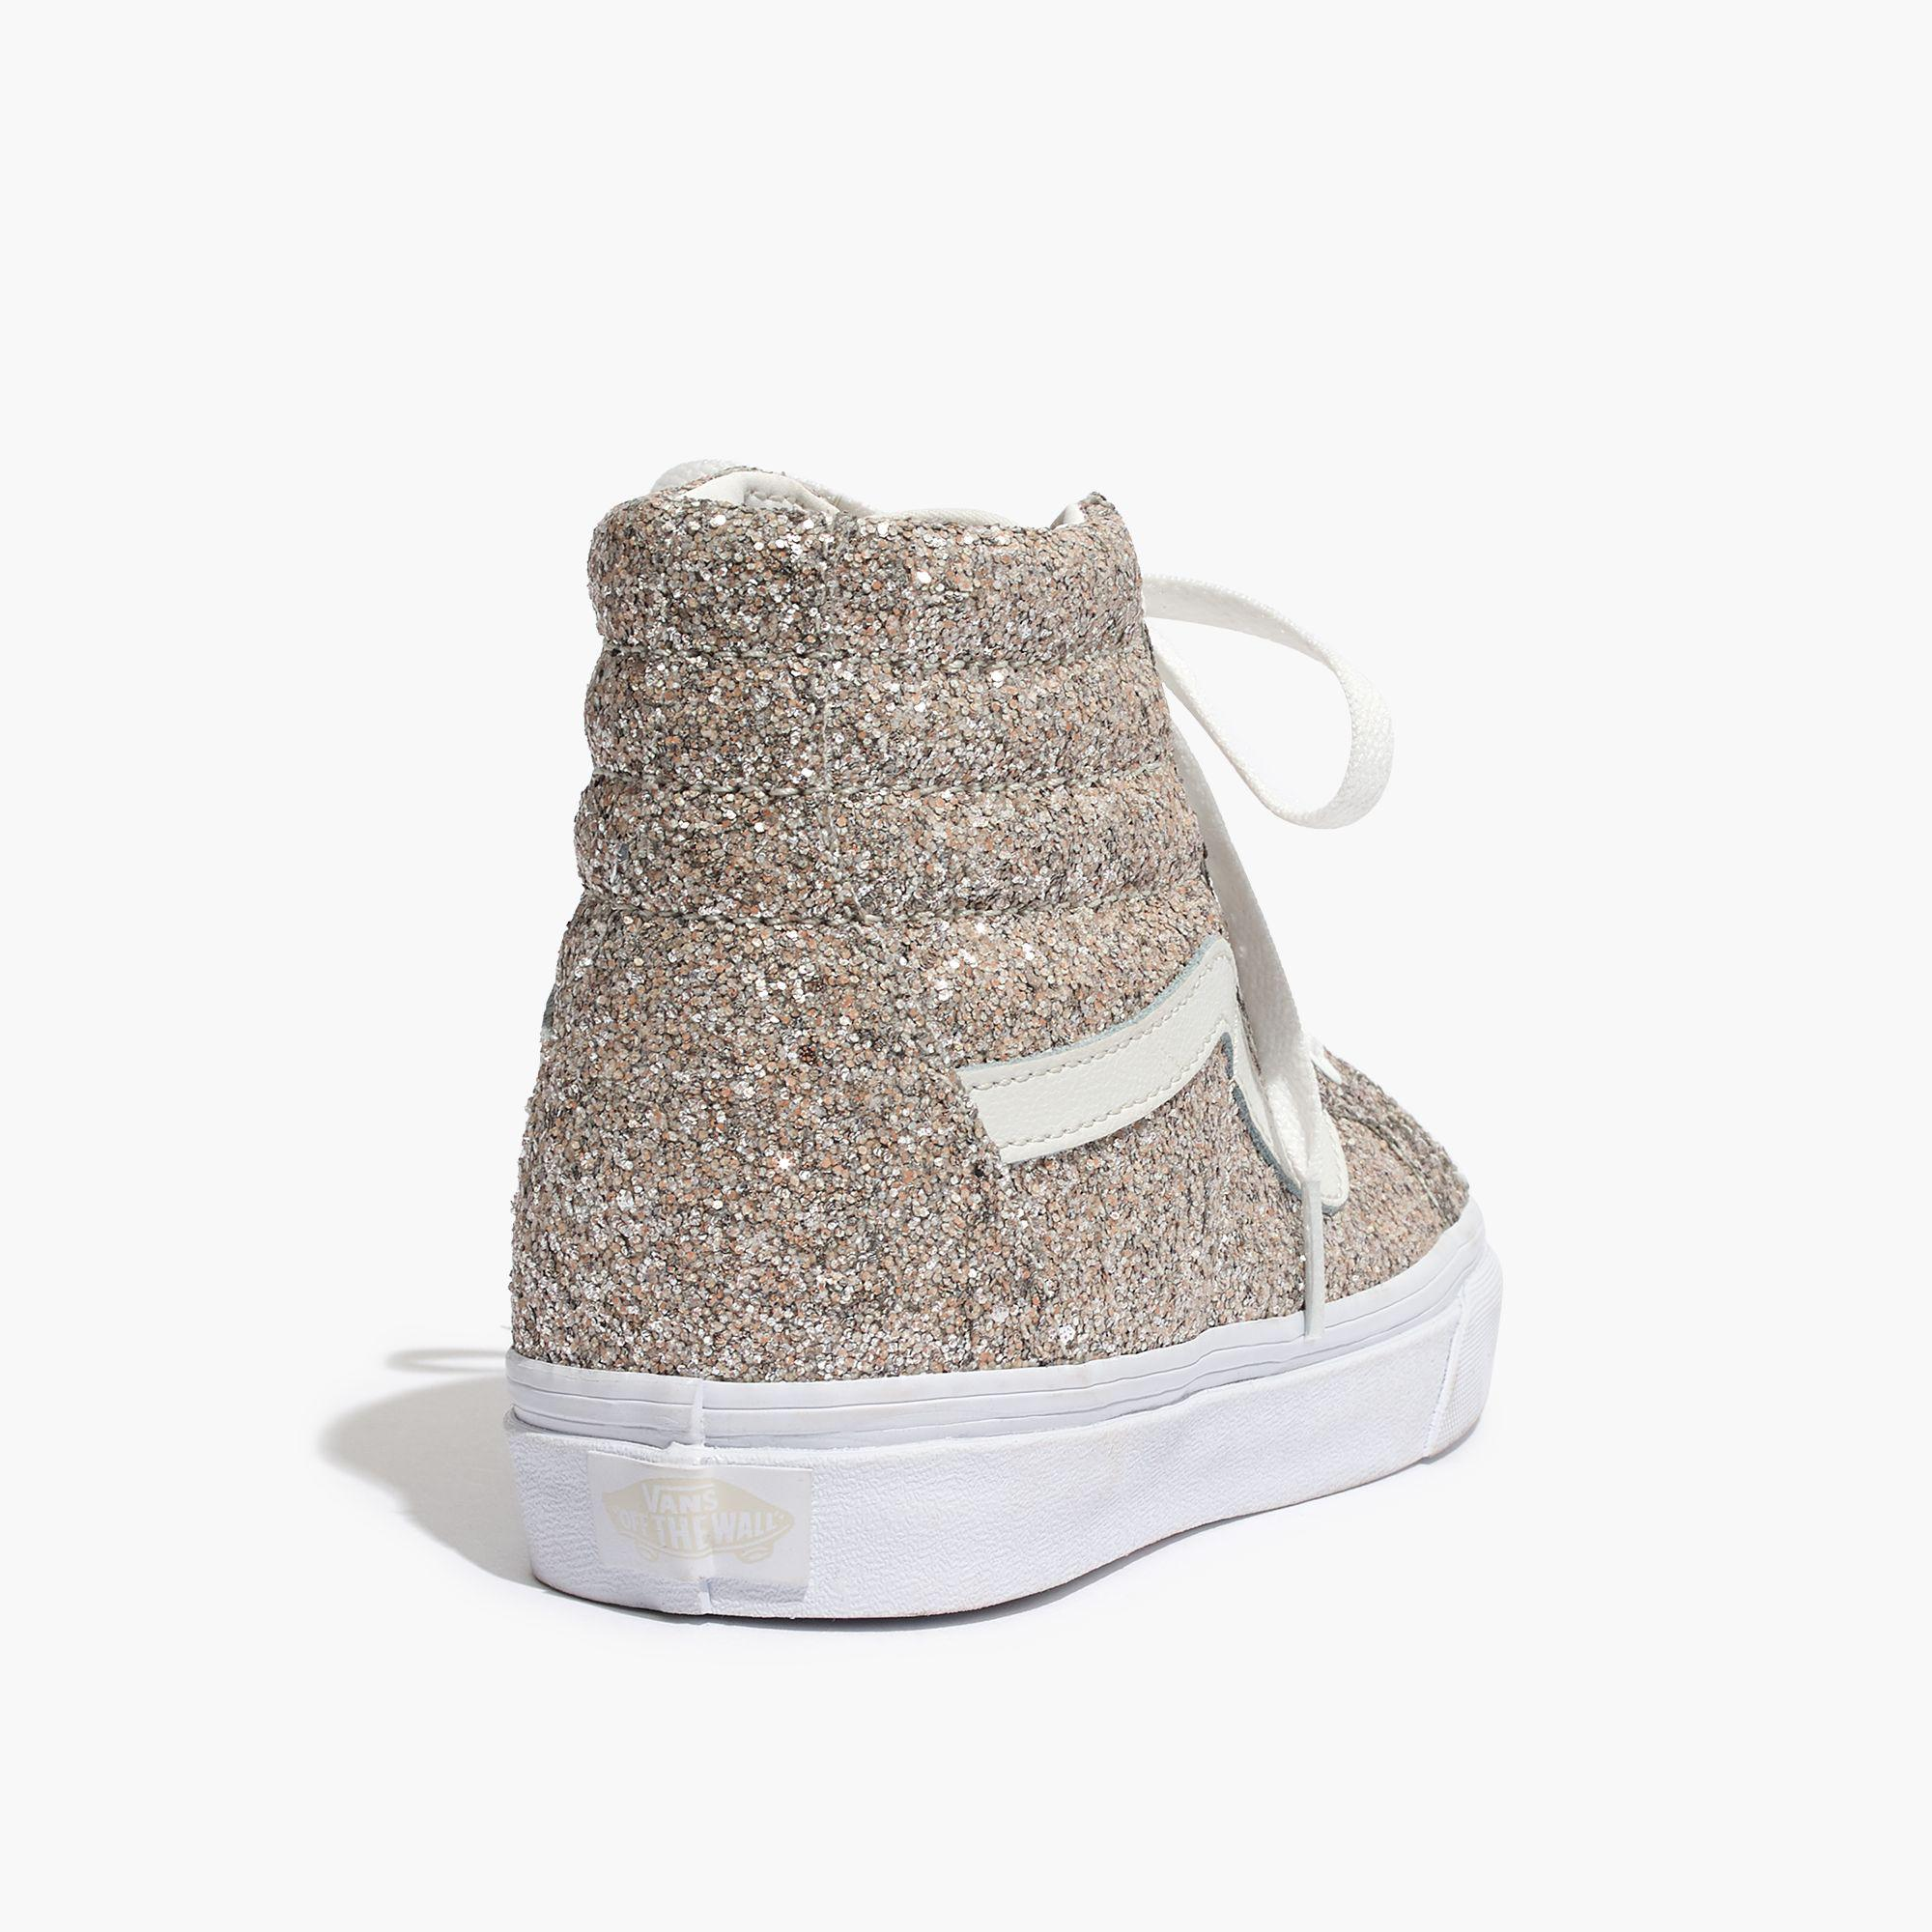 b2883c00a9a6aa Lyst - Madewell Vans® Unisex Sk8-hi High-top Sneakers In Glitter